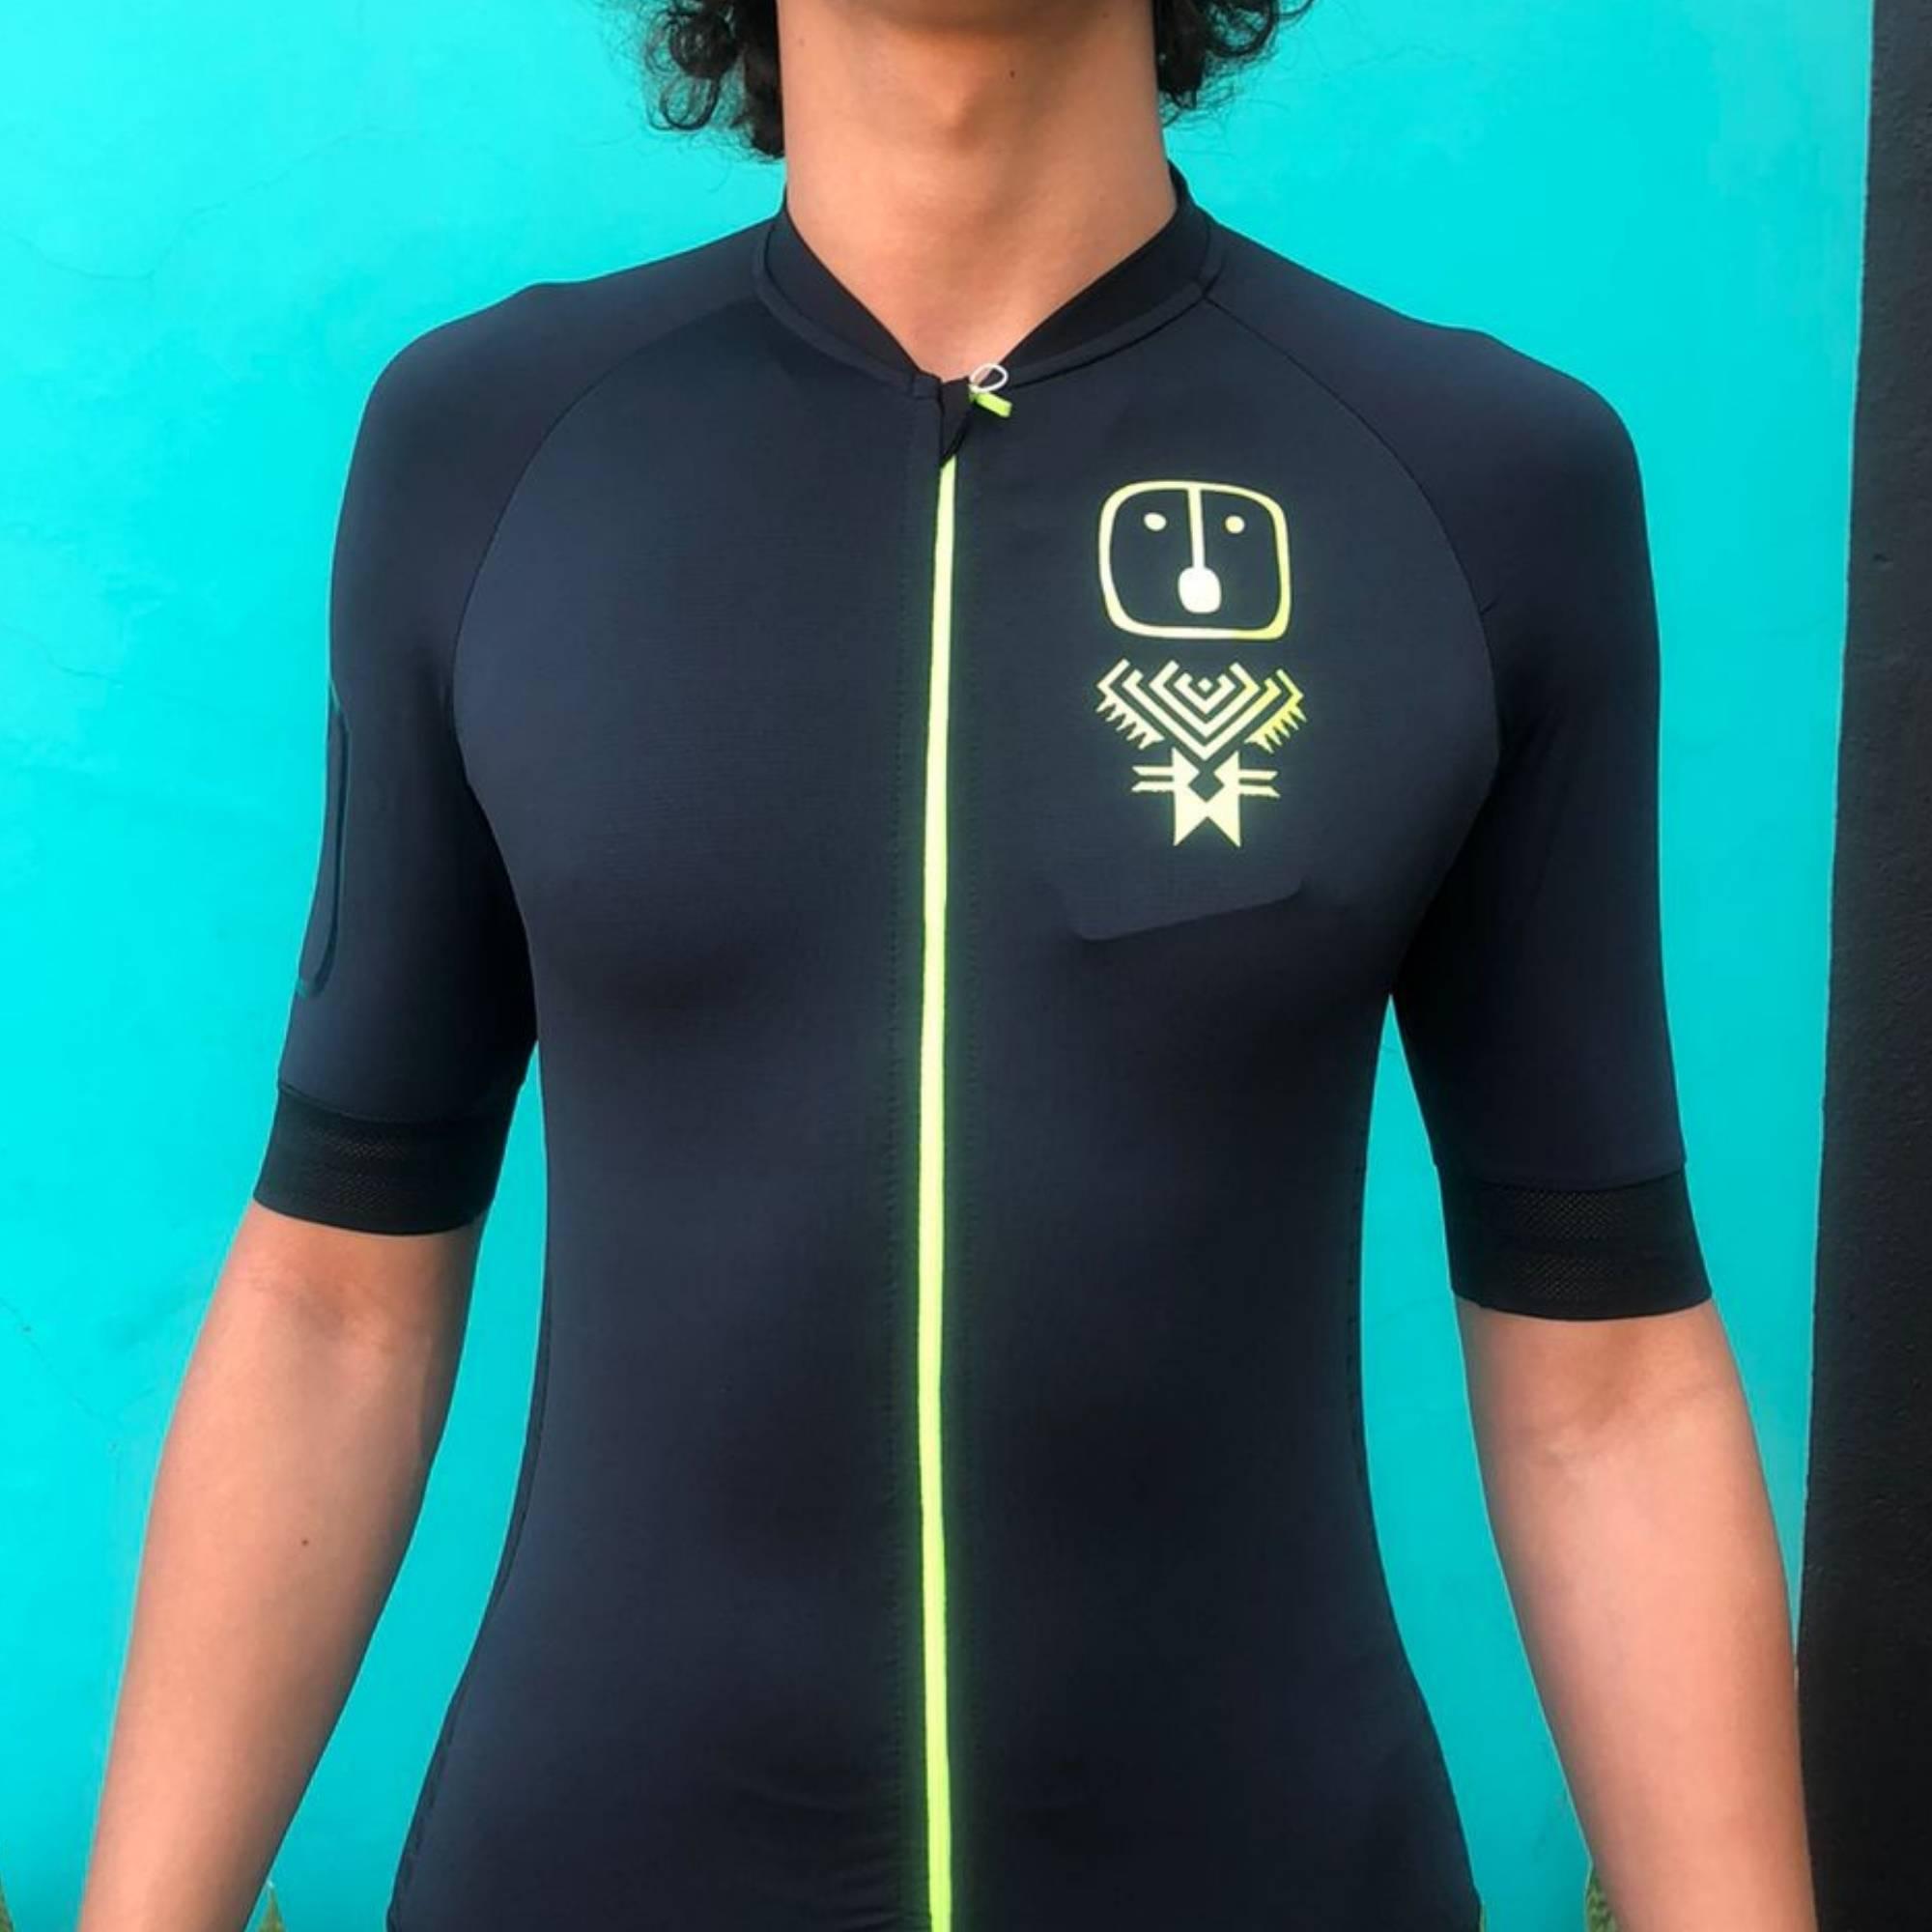 Camisa Ciclismo Racing Evo Black / Neon - Masculina